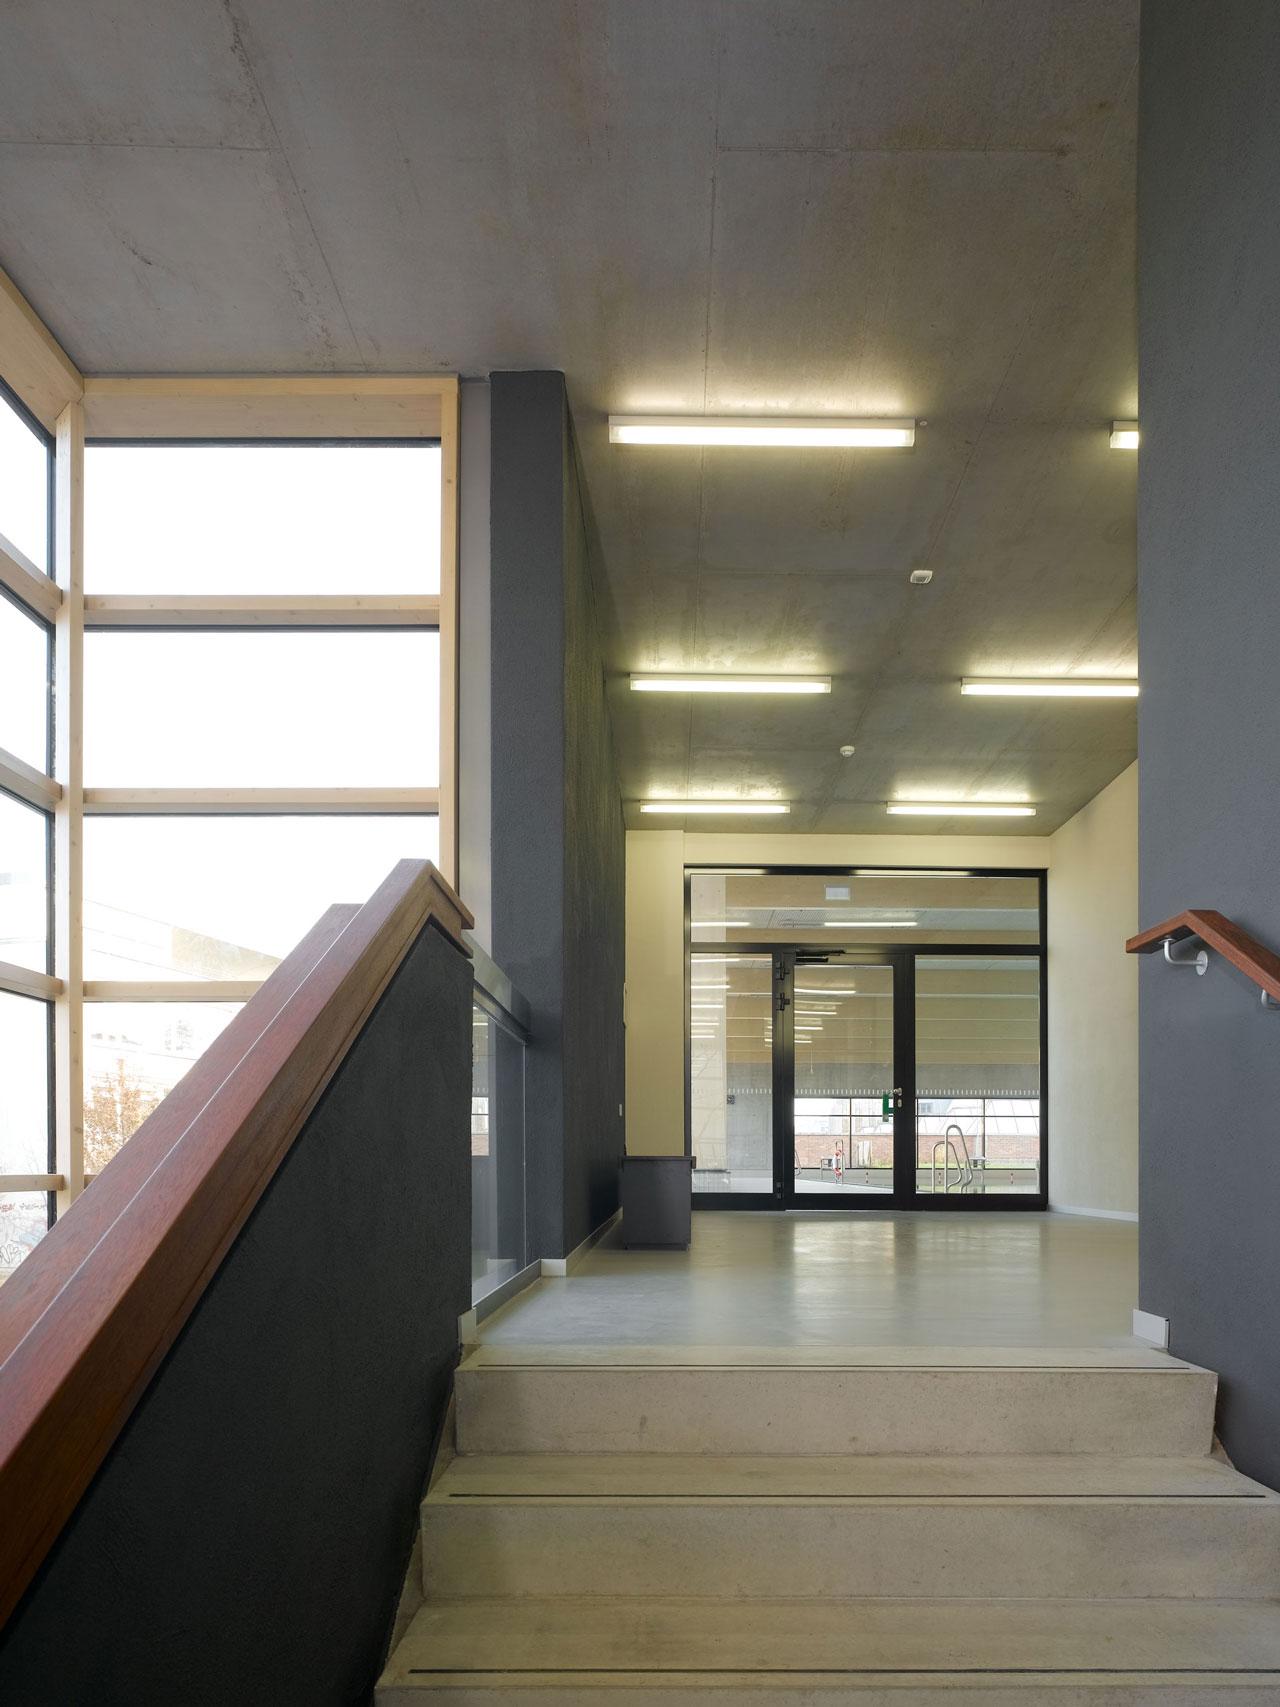 Hallenbad Neubau, Foyer Treppe